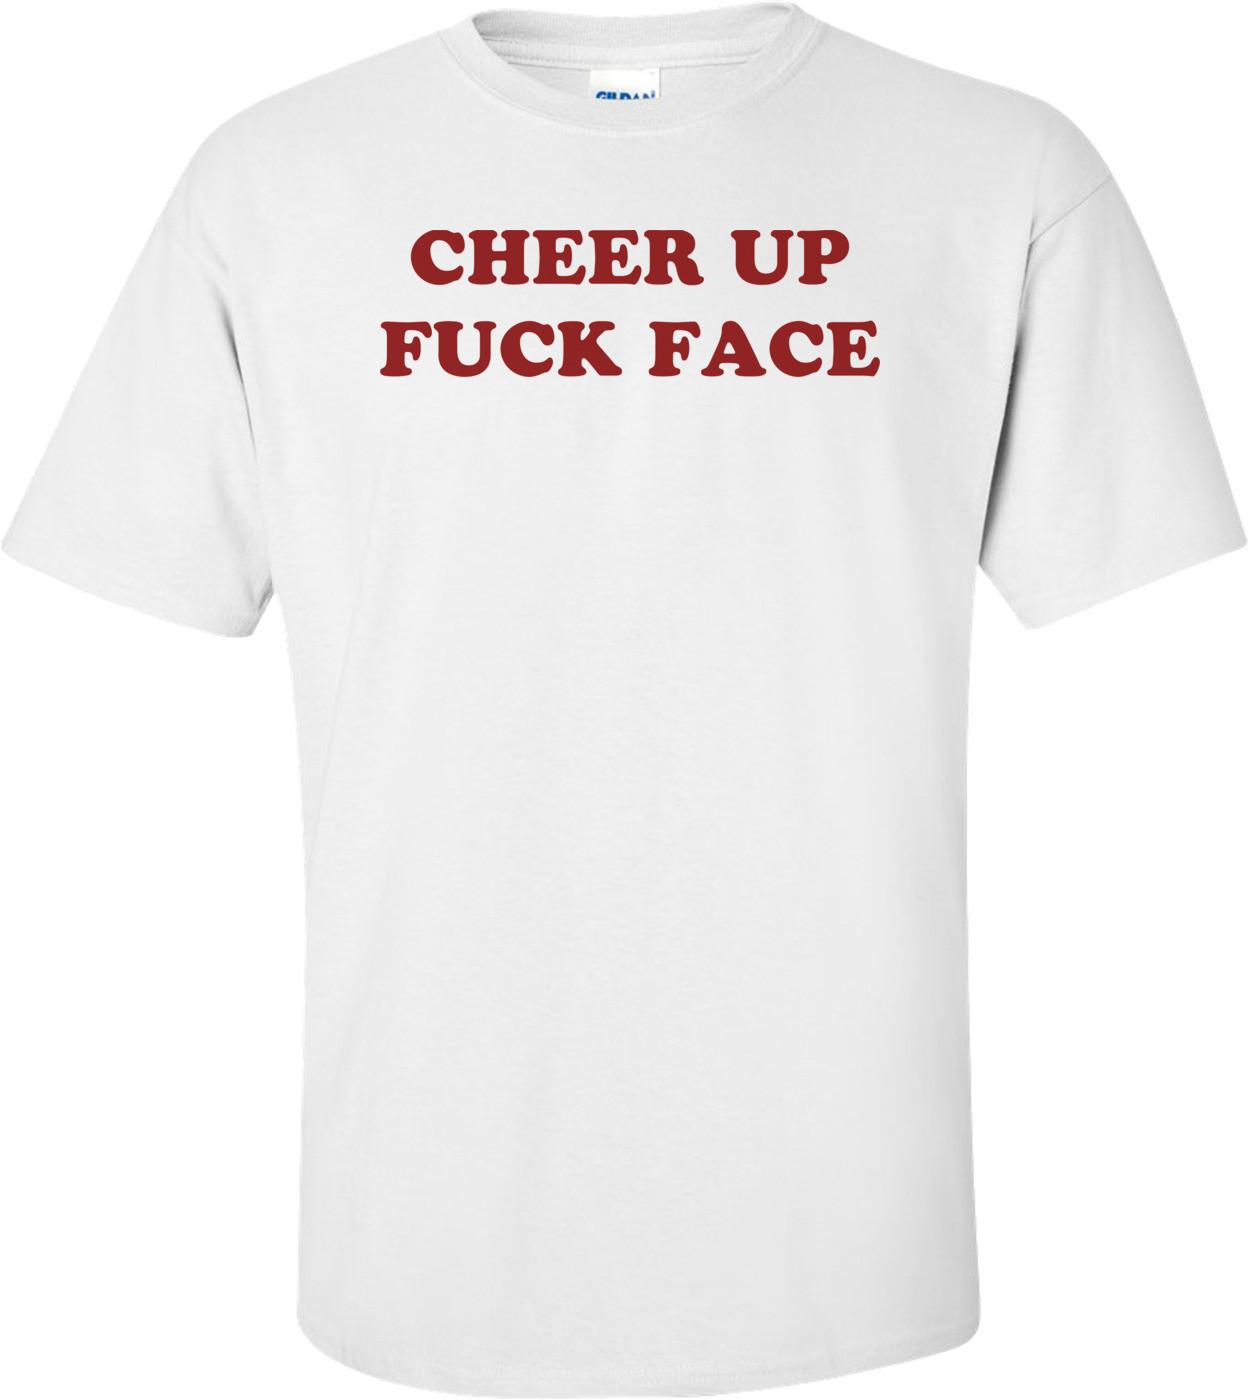 CHEER UP FUCK FACE Shirt